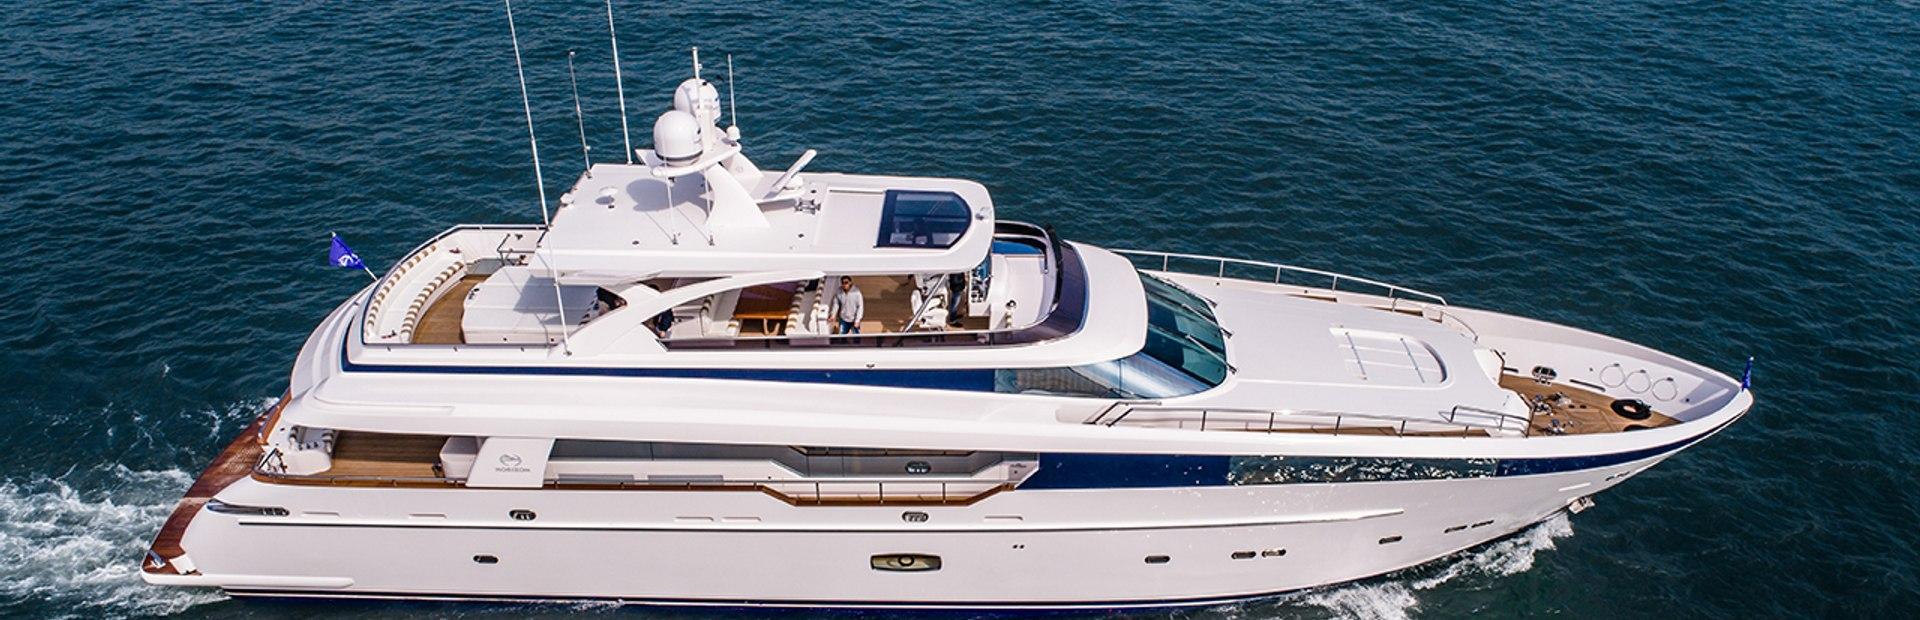 CC110 Yacht Charter